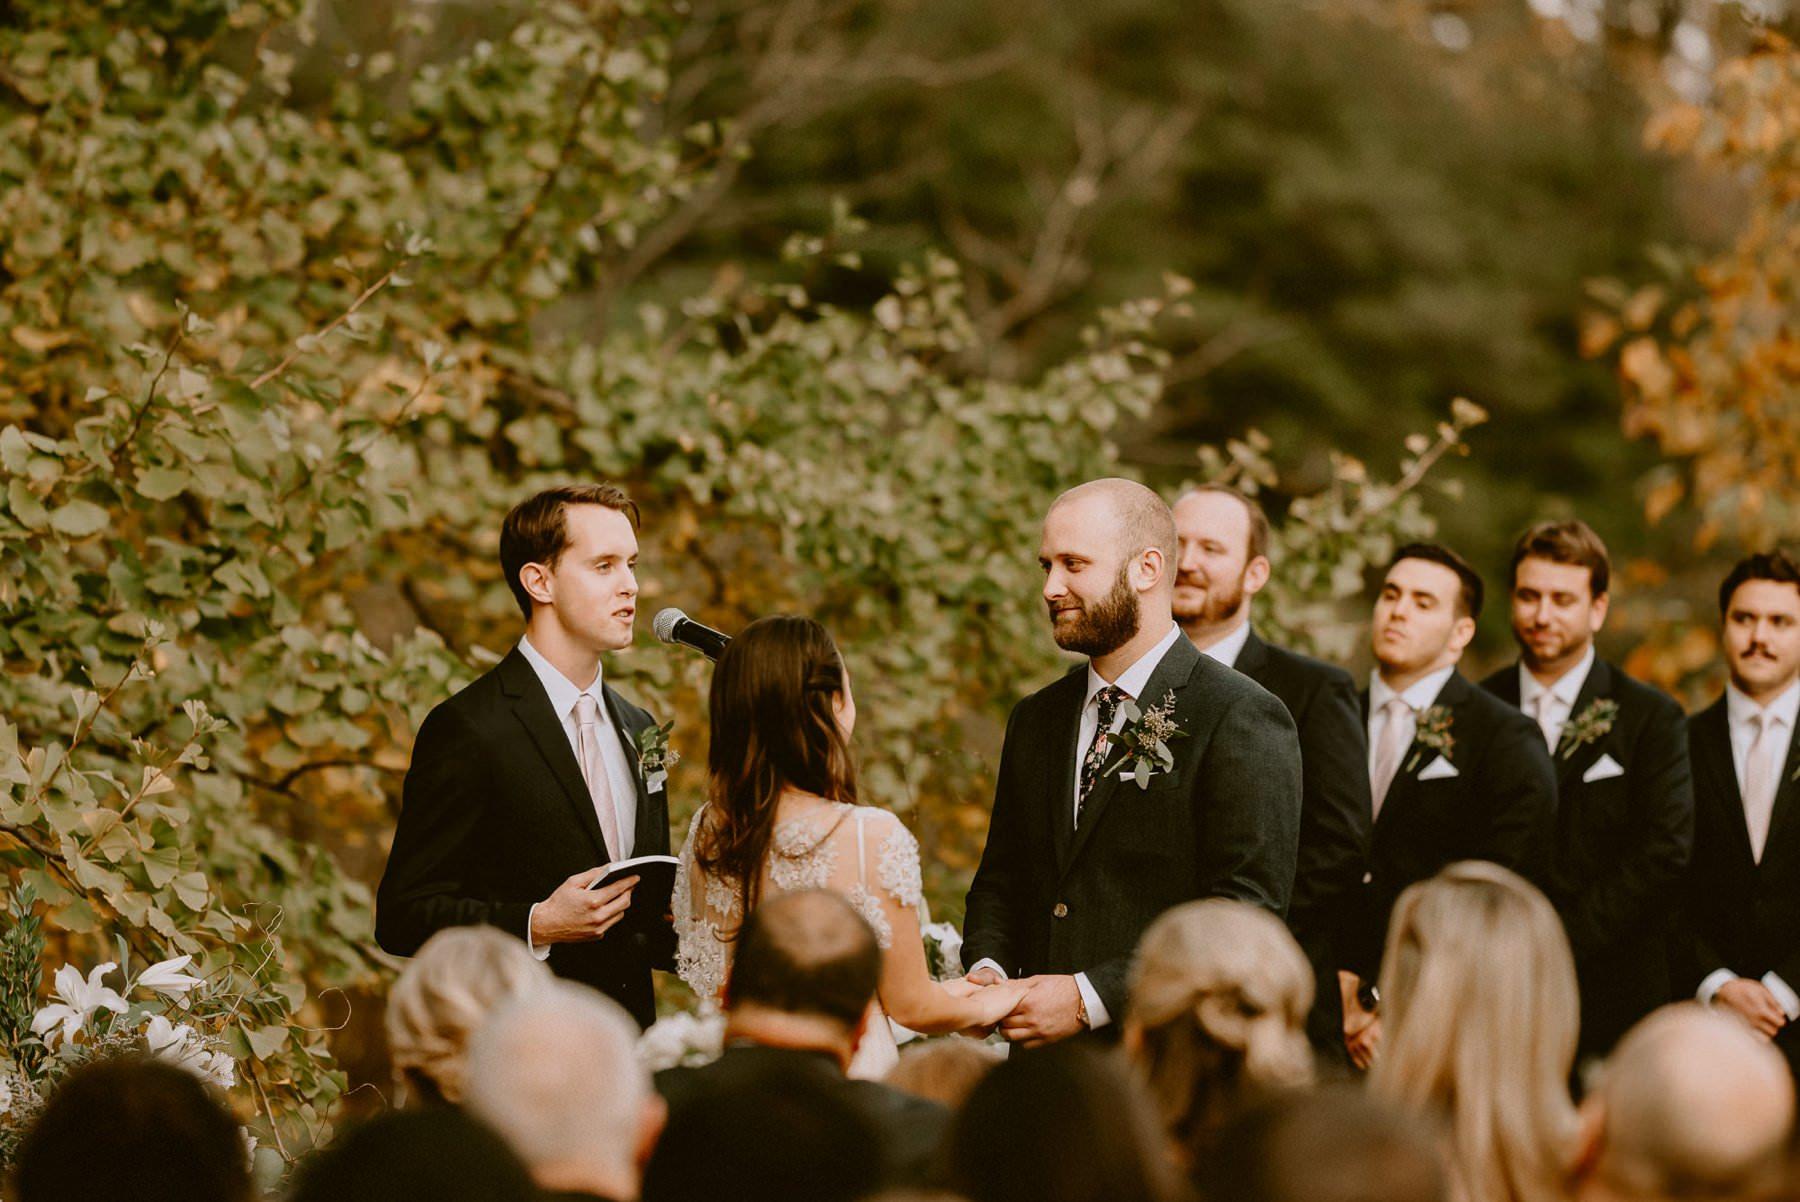 Tyler_arboretum_wedding-058.jpg